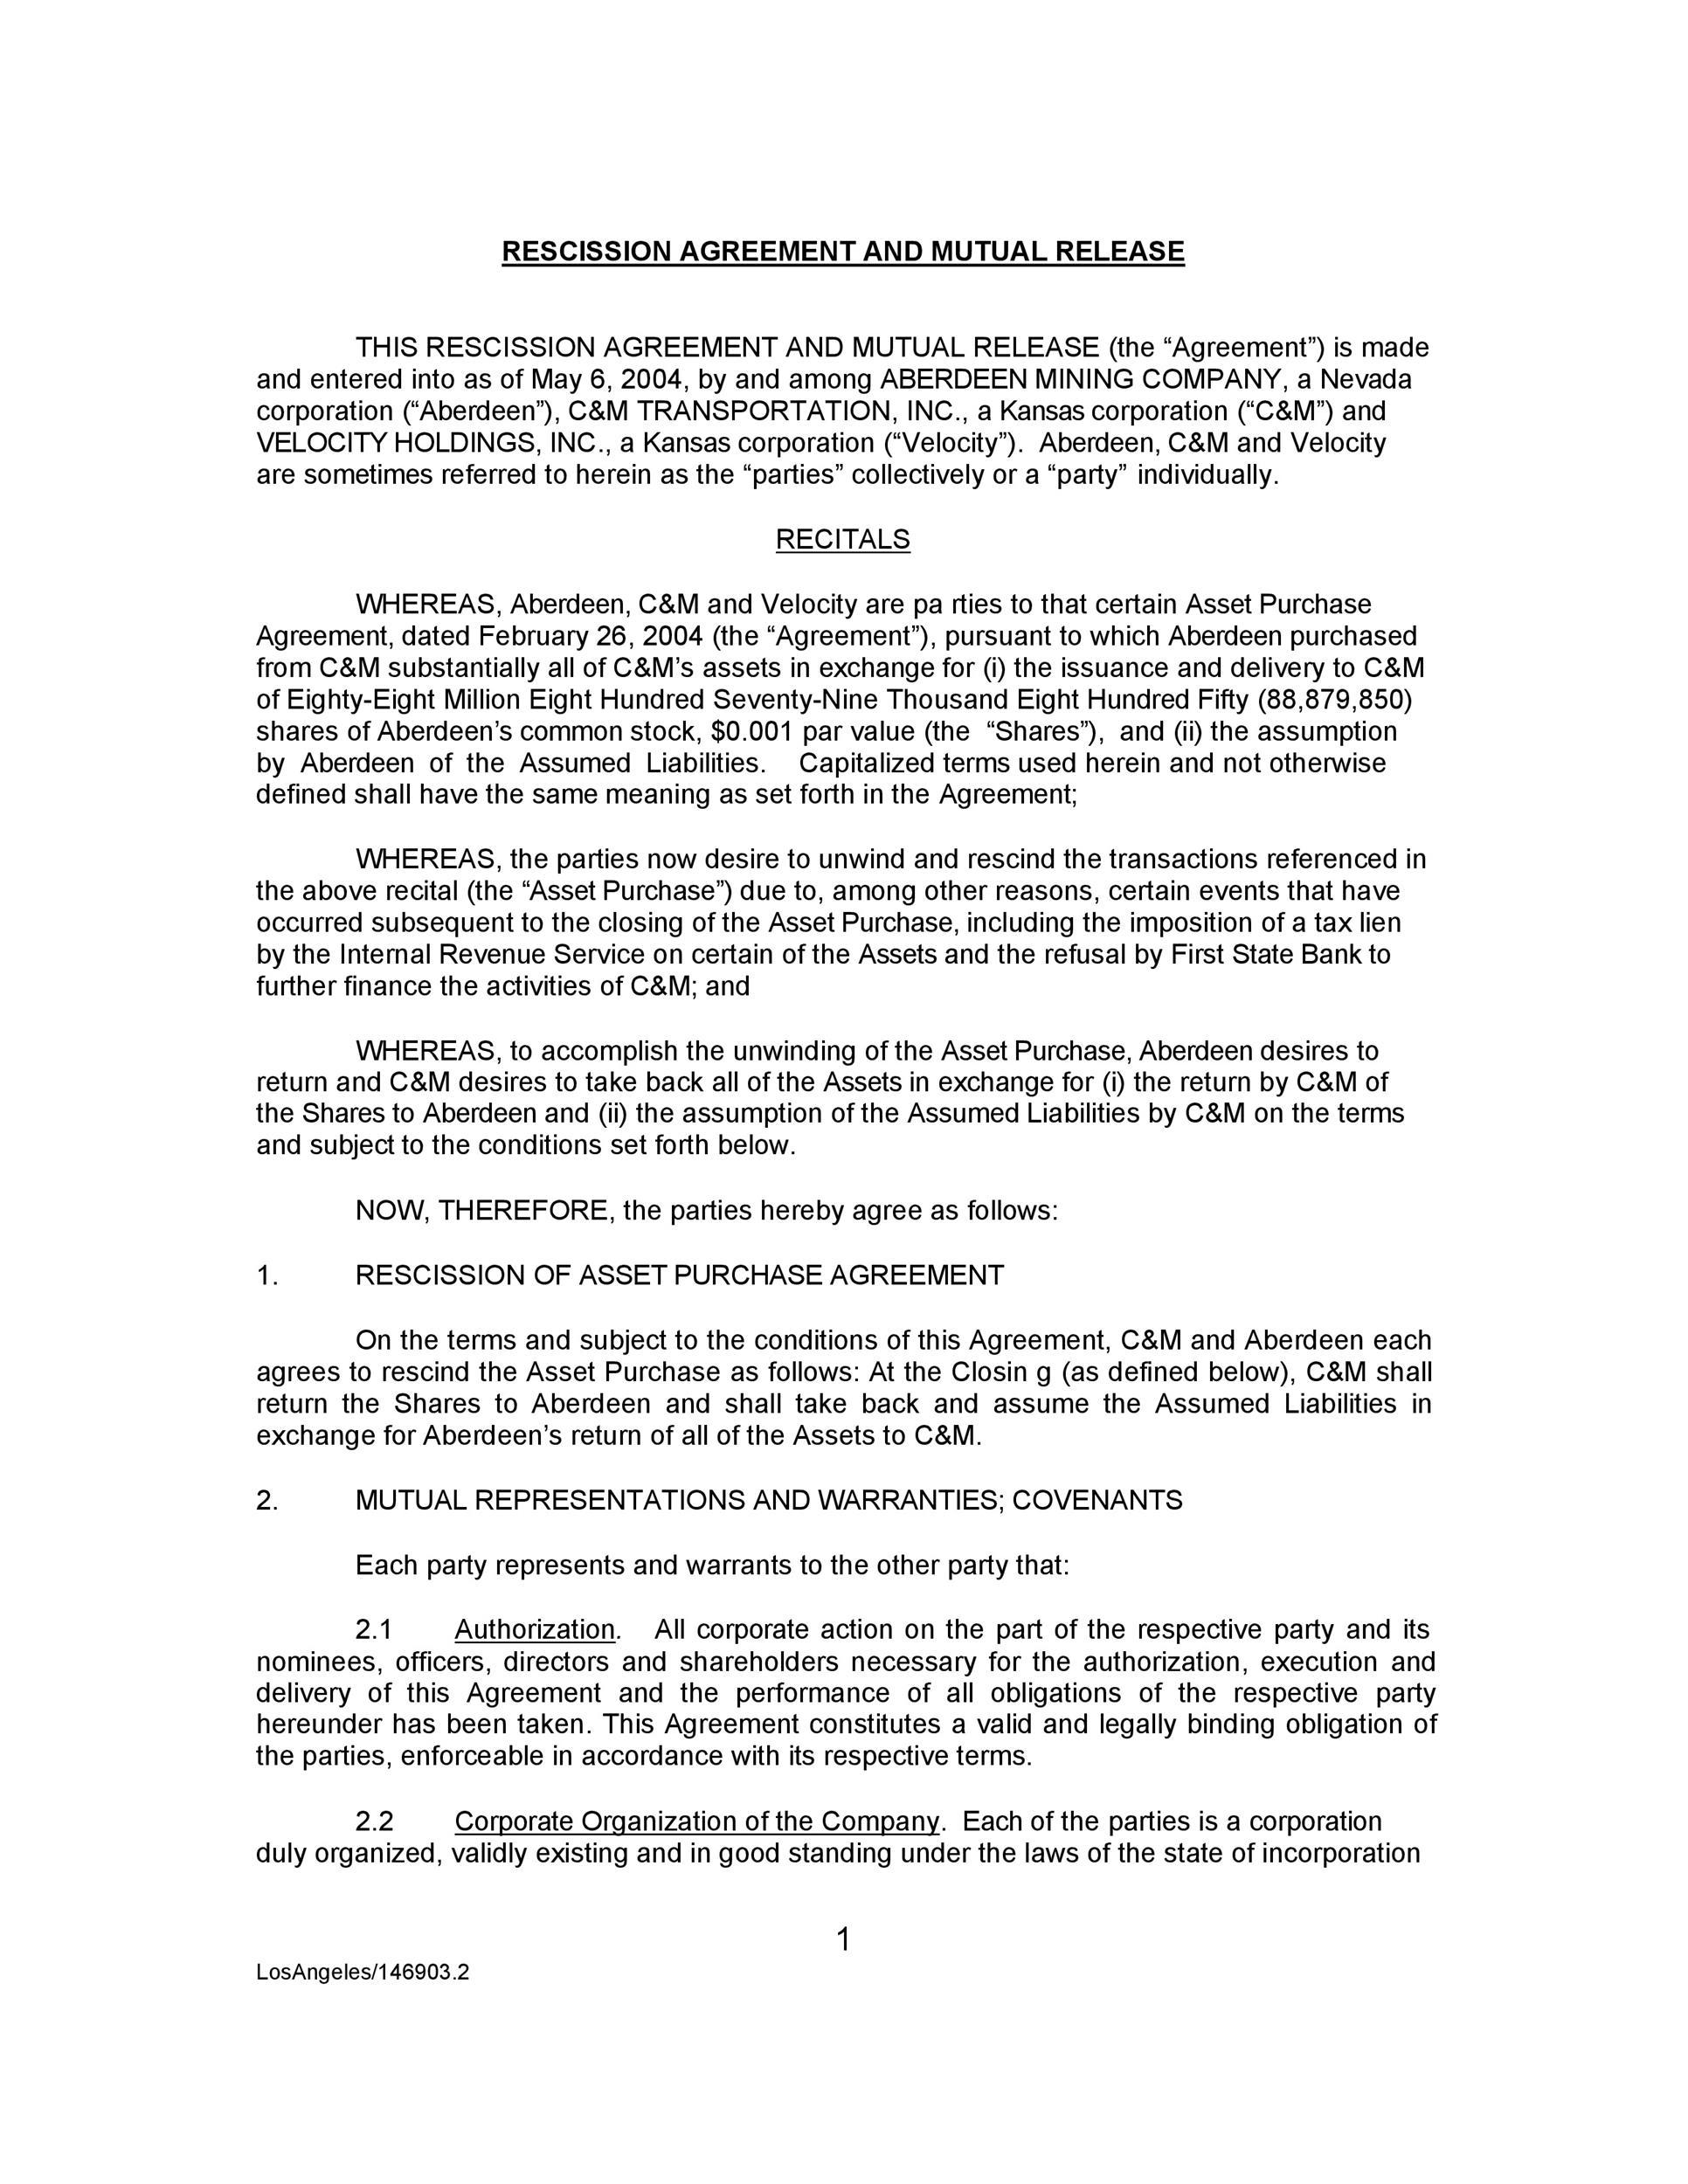 Free rescission agreement 01